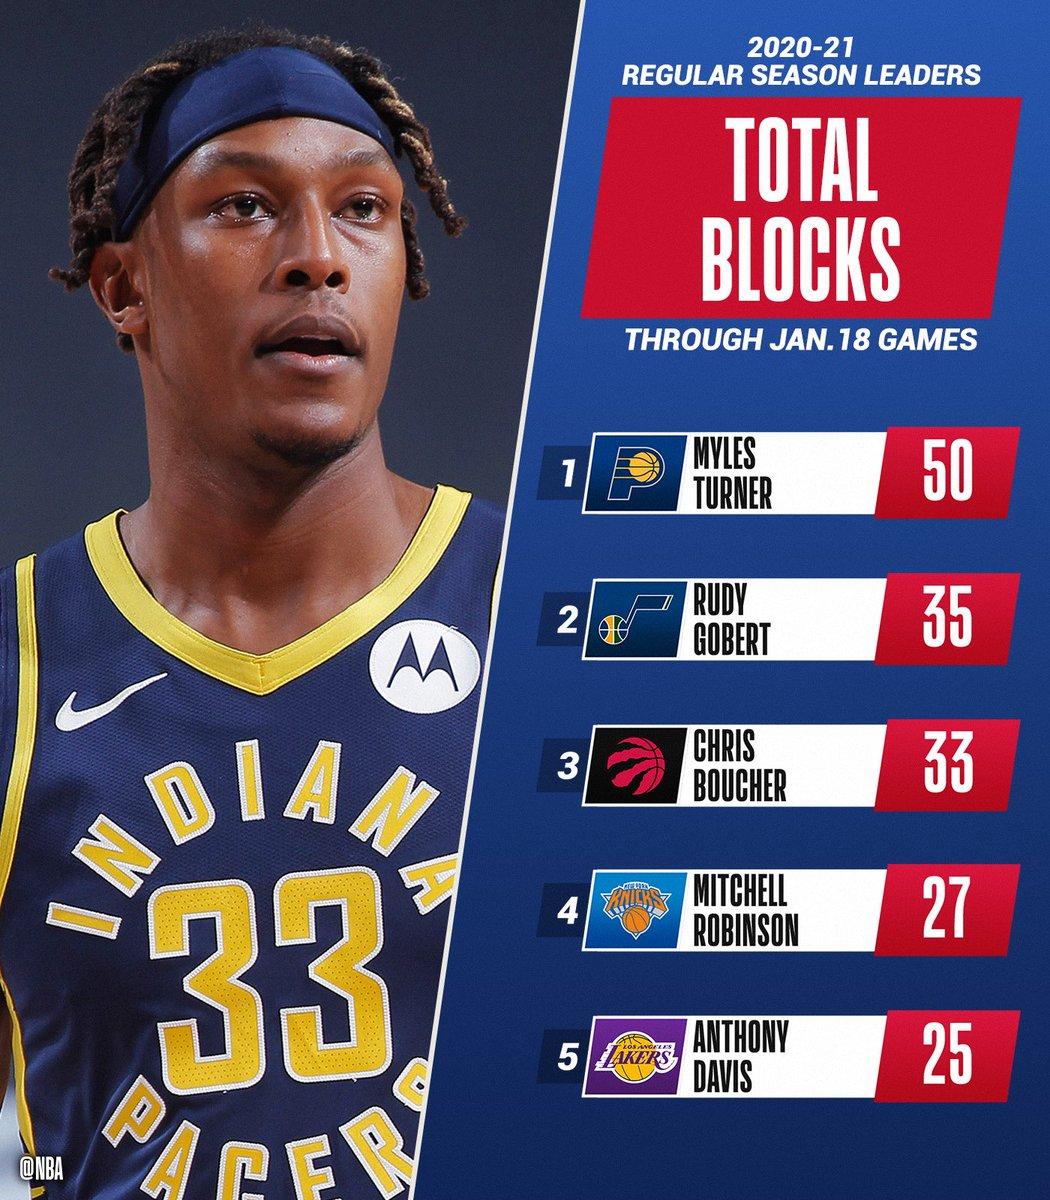 The TOTAL BLOCKS and BLOCKS PER GAME leaders of the @NBA season through 1/18.   📊: https://t.co/Z32NUvmrF9 https://t.co/9V0Yi3DOvS